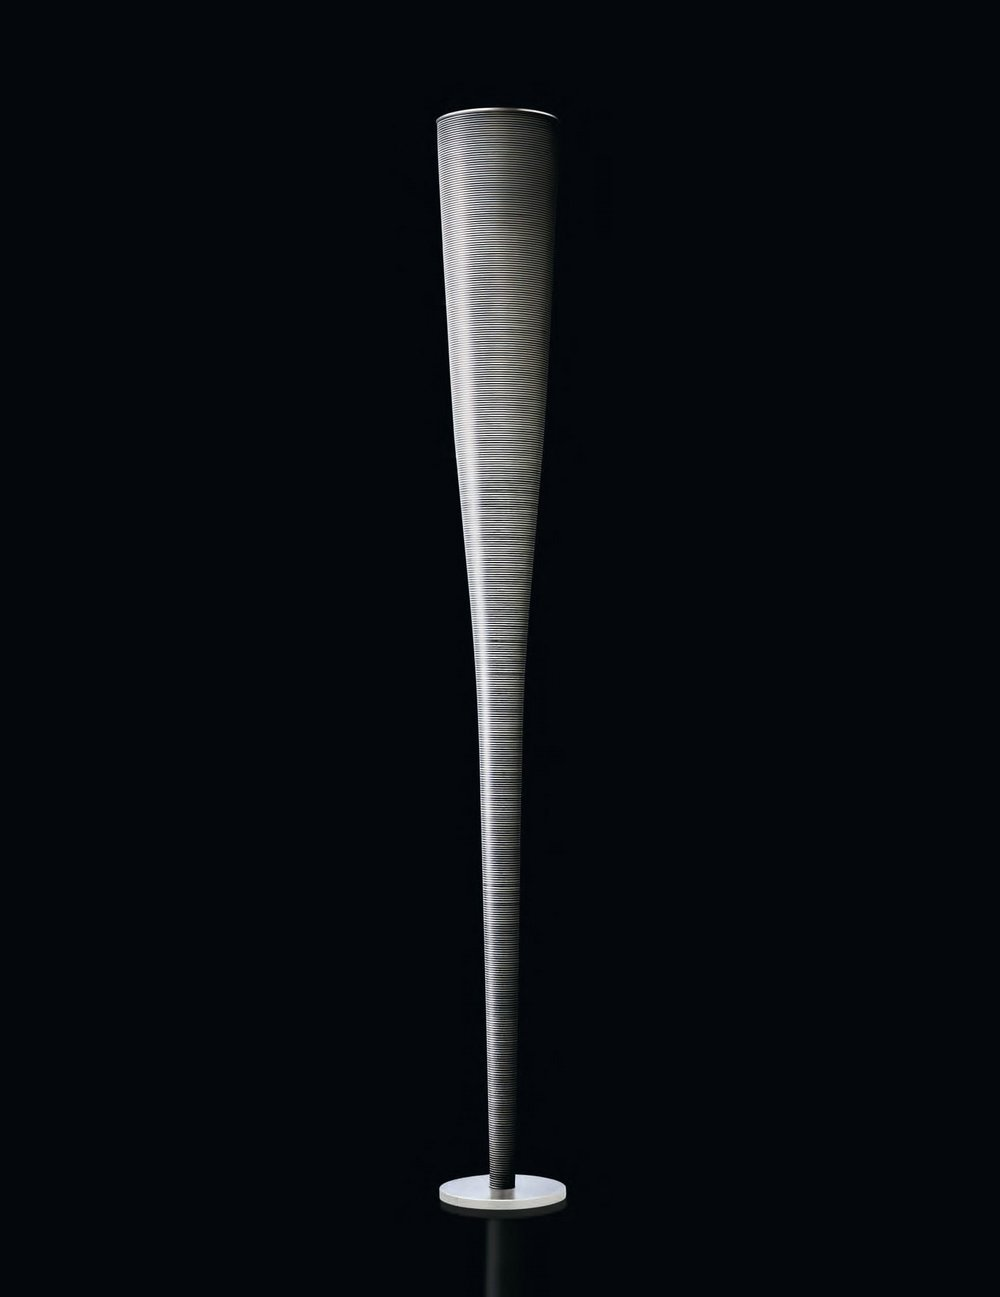 foscarini mite floor lamp led black 111003l 20 l mparas. Black Bedroom Furniture Sets. Home Design Ideas